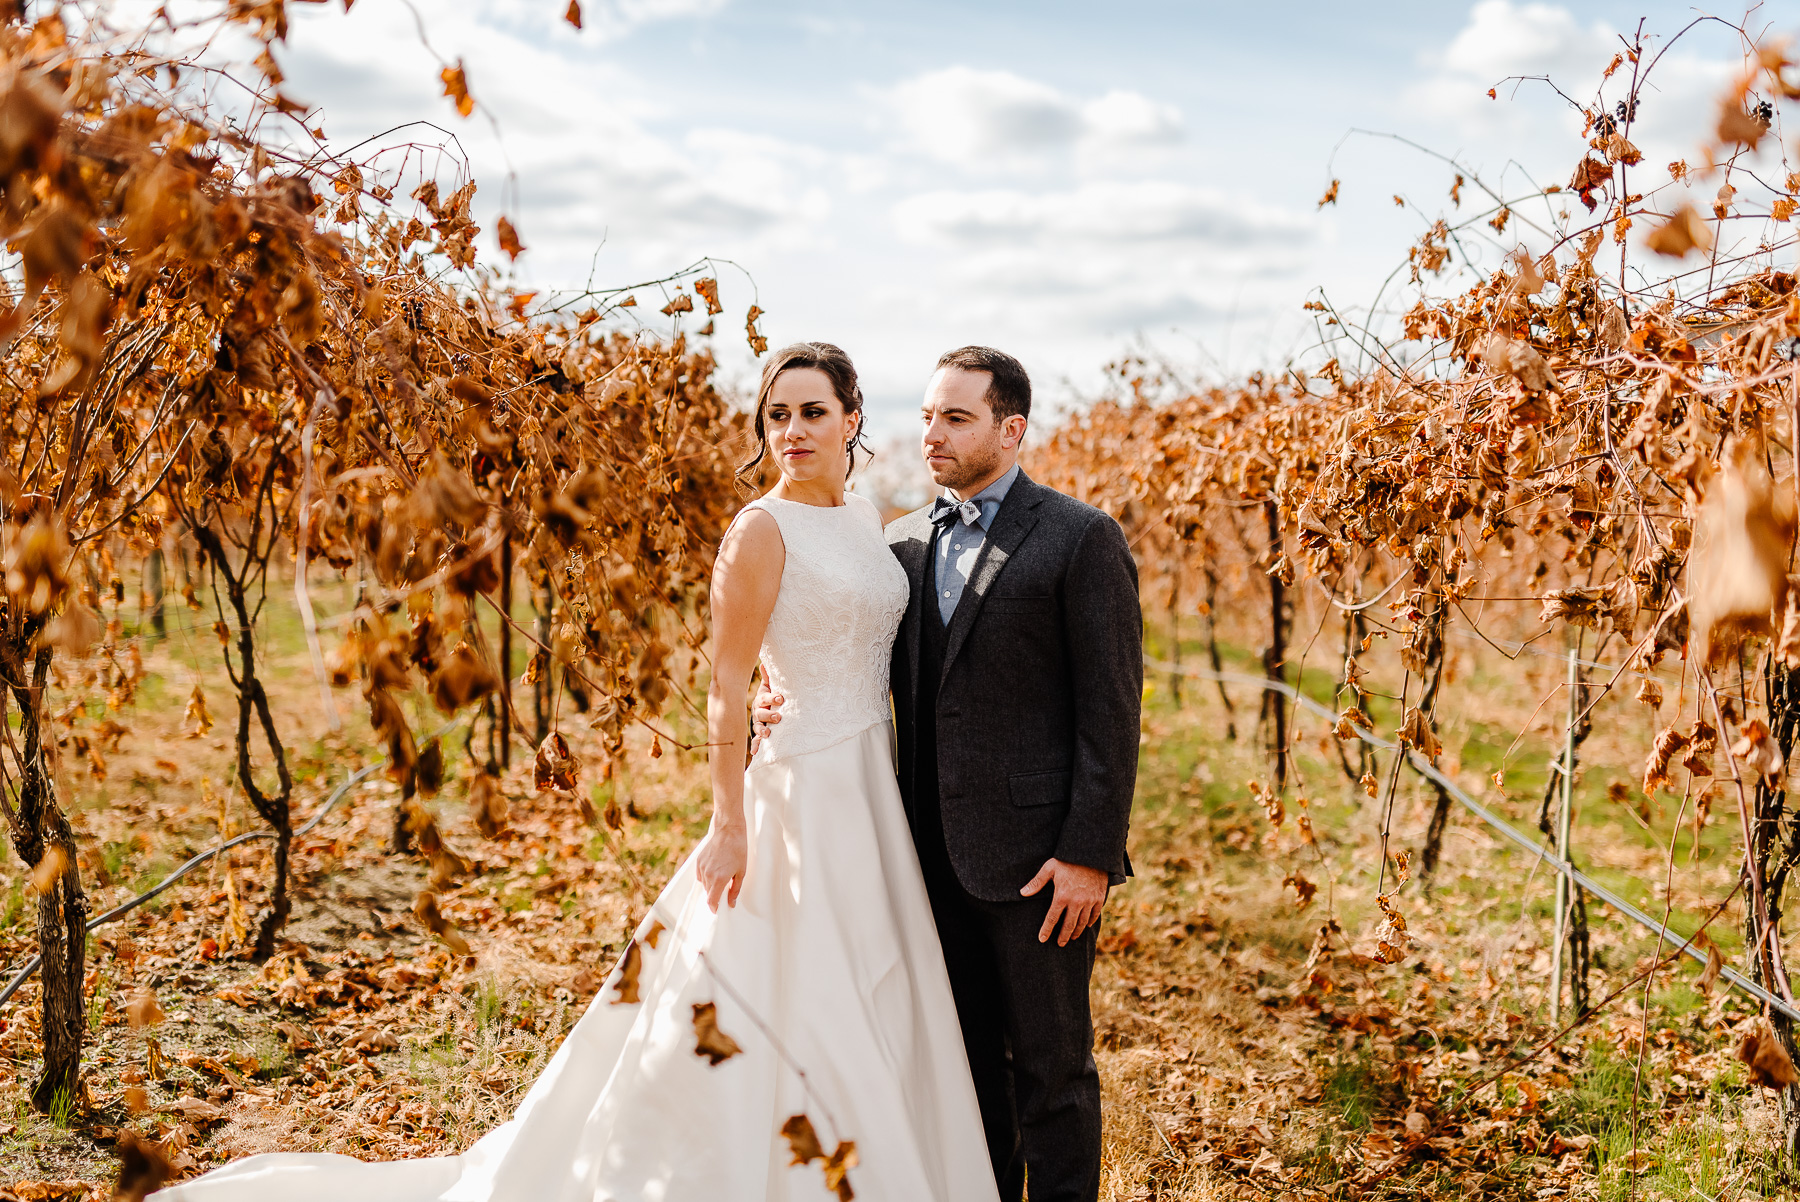 50-Laurita Winery Wedding New Jersey Wedding Photographer Laurita Winery Weddings Longbrook Photography.jpg